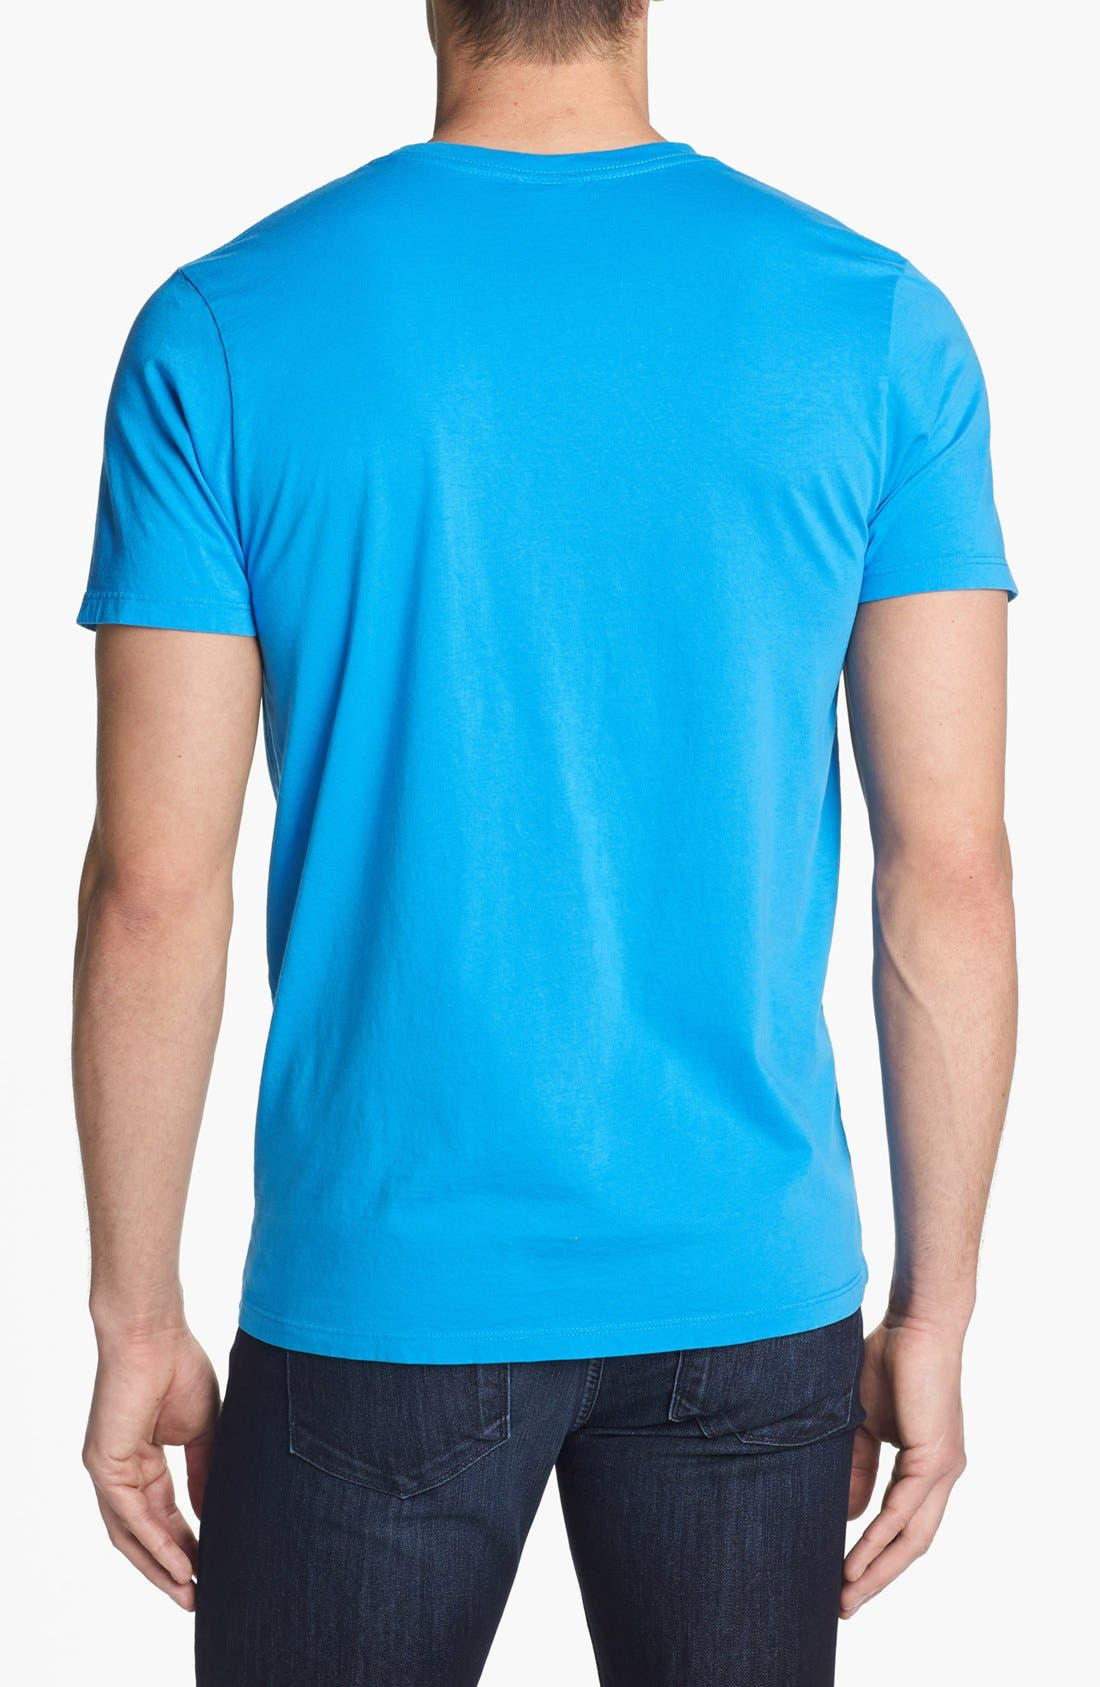 Alternate Image 2  - Junk Food 'Carolina Panthers - Kick Off' Graphic T-Shirt